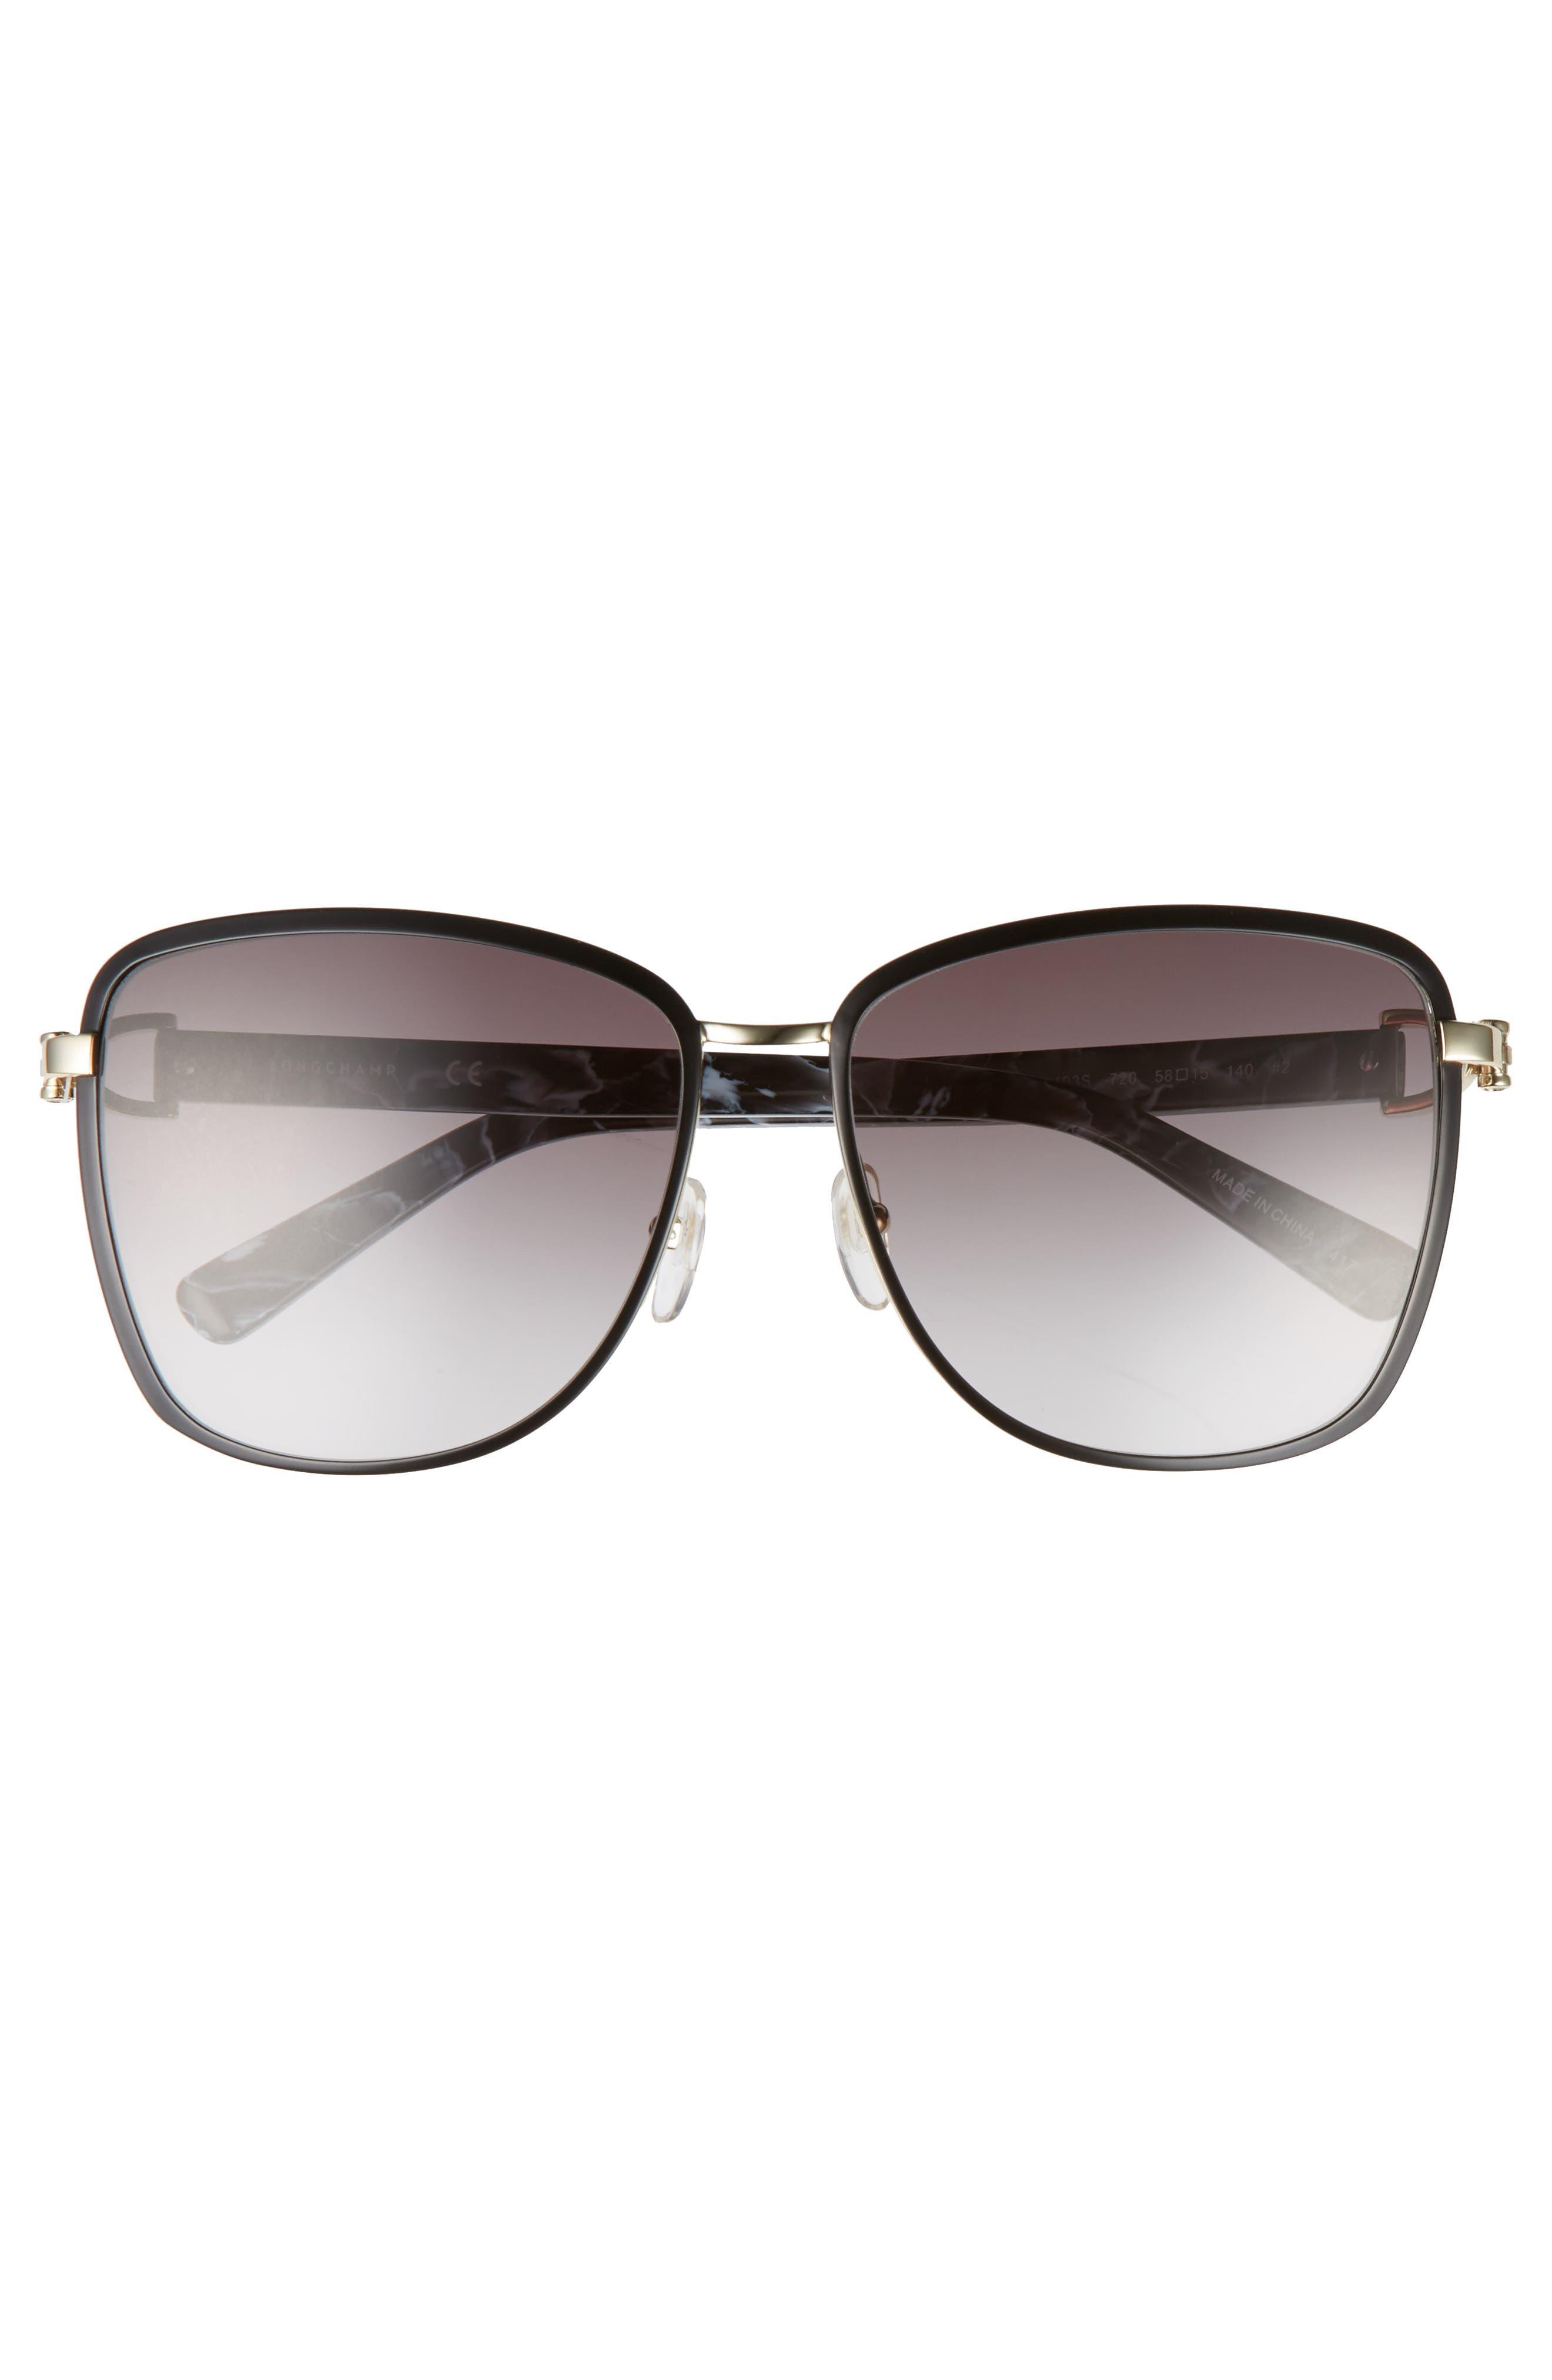 58mm Metal Sunglasses,                             Alternate thumbnail 3, color,                             GOLD/ BLACK